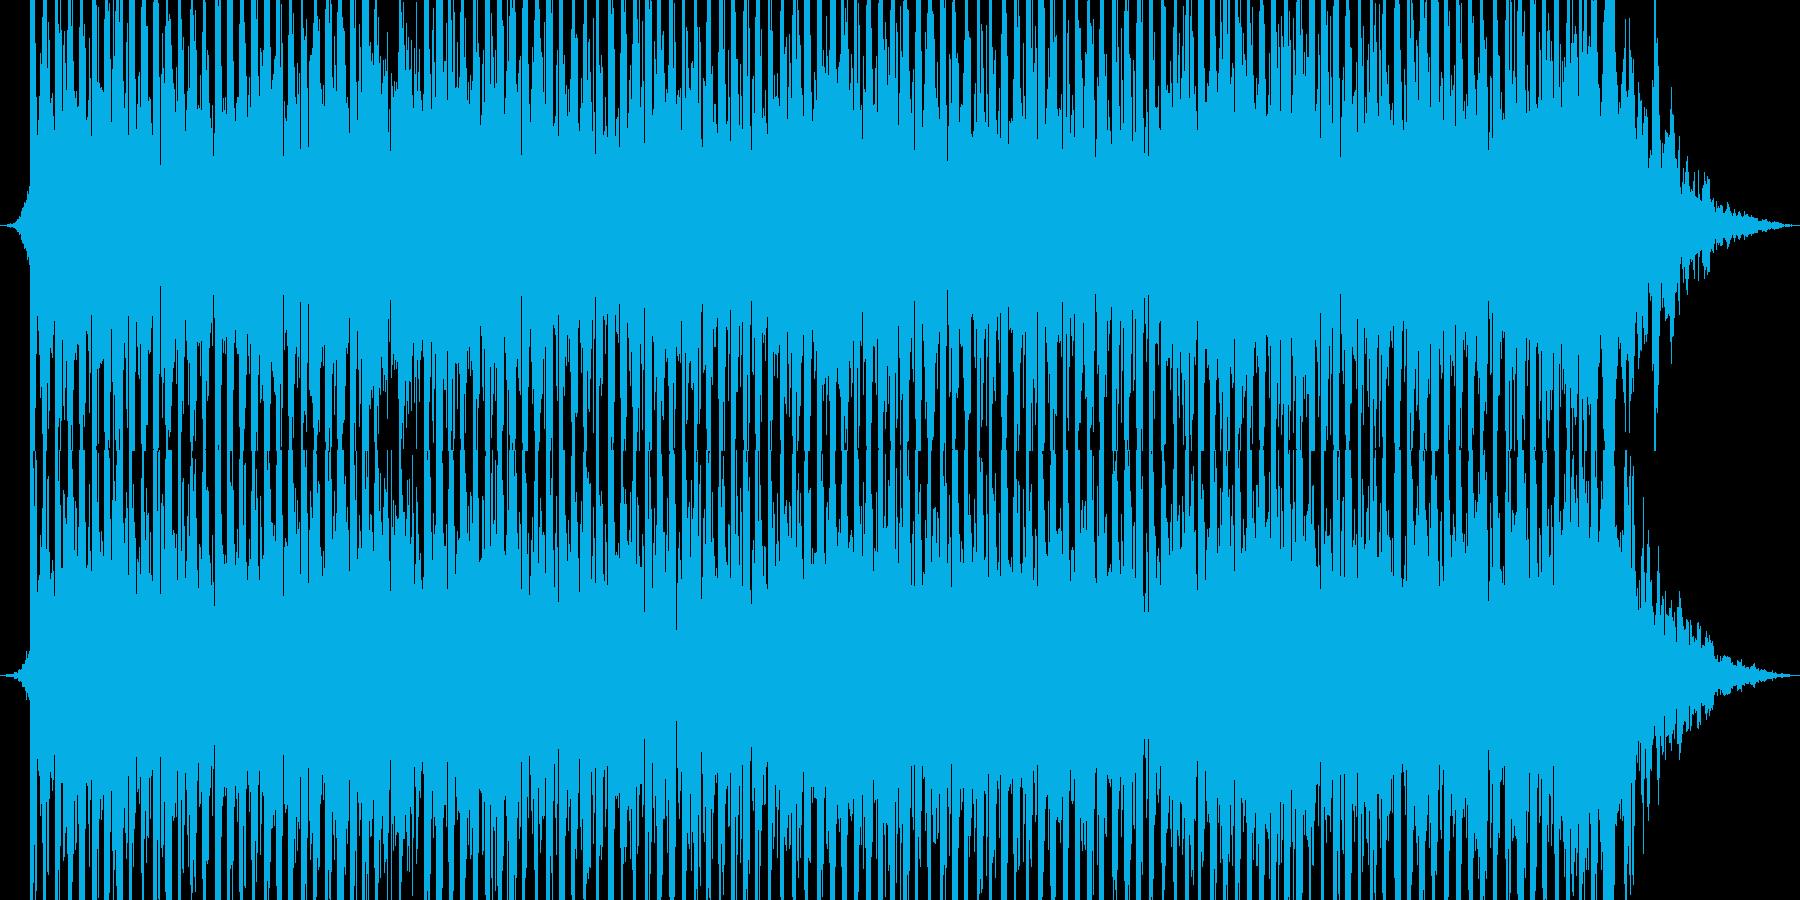 No main sound / Fighting spirit x Sexy EDM_ Flashy's reproduced waveform